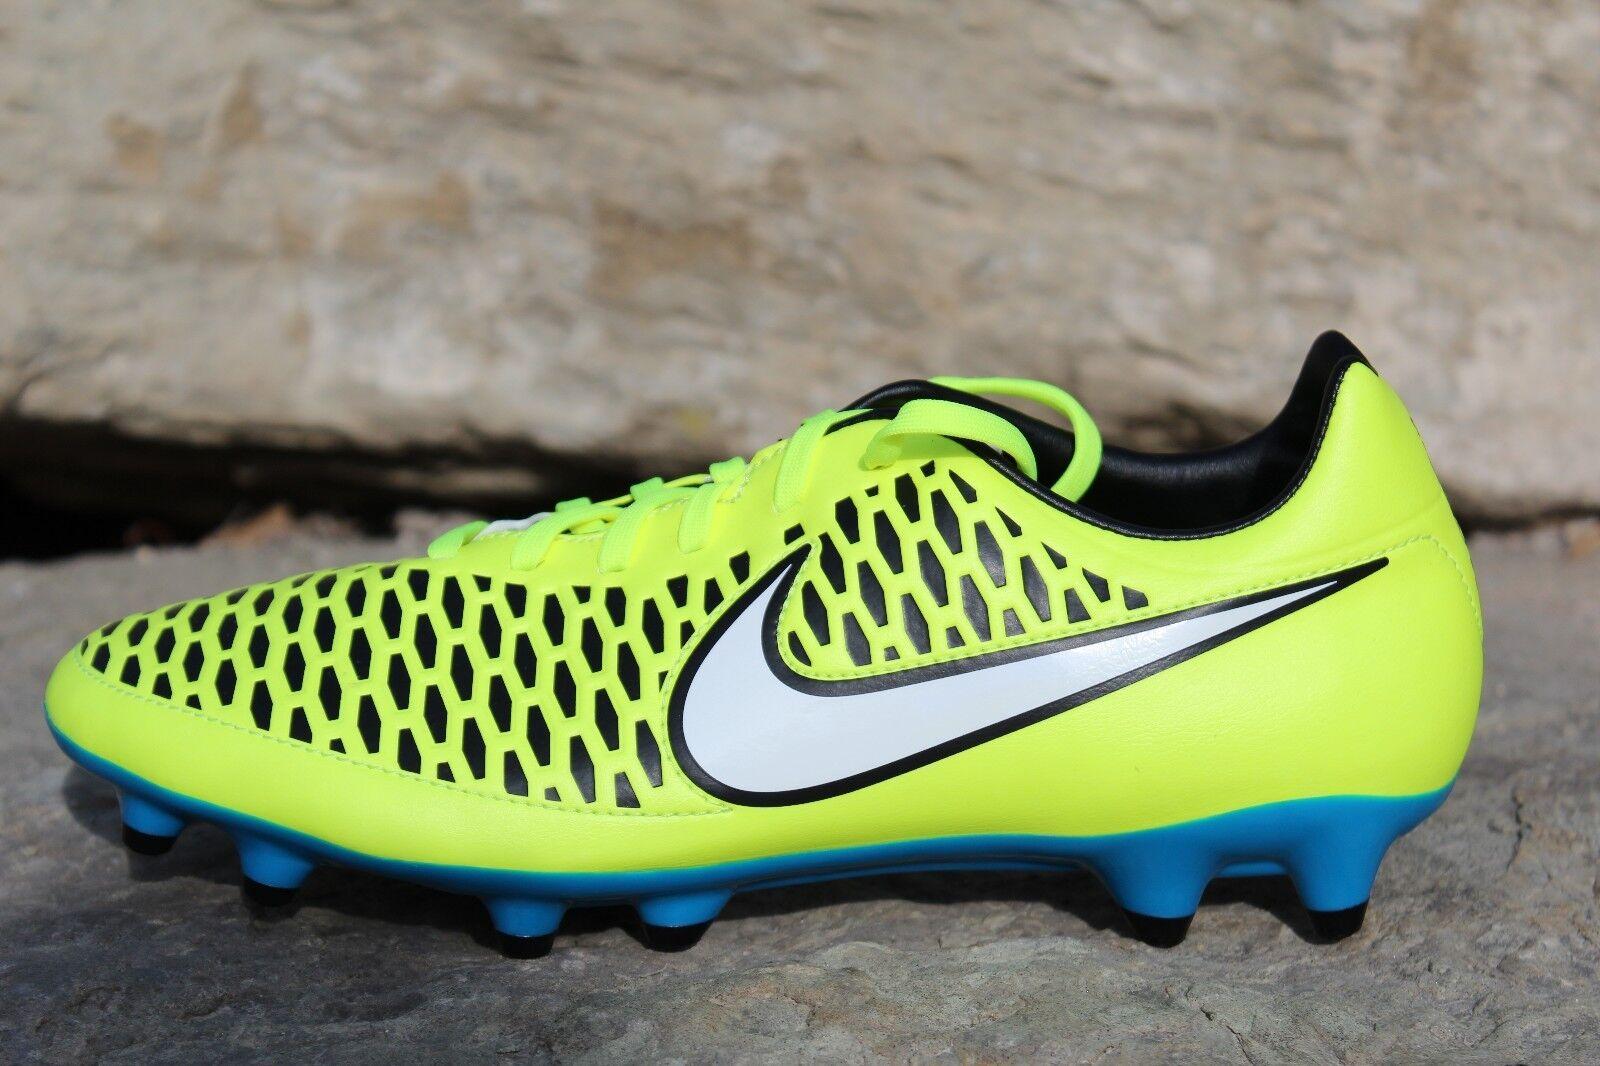 Nike Womens Magista Onda FG Sz 6.5 Blue Volt Soccer Cleats World Cup 658569 700